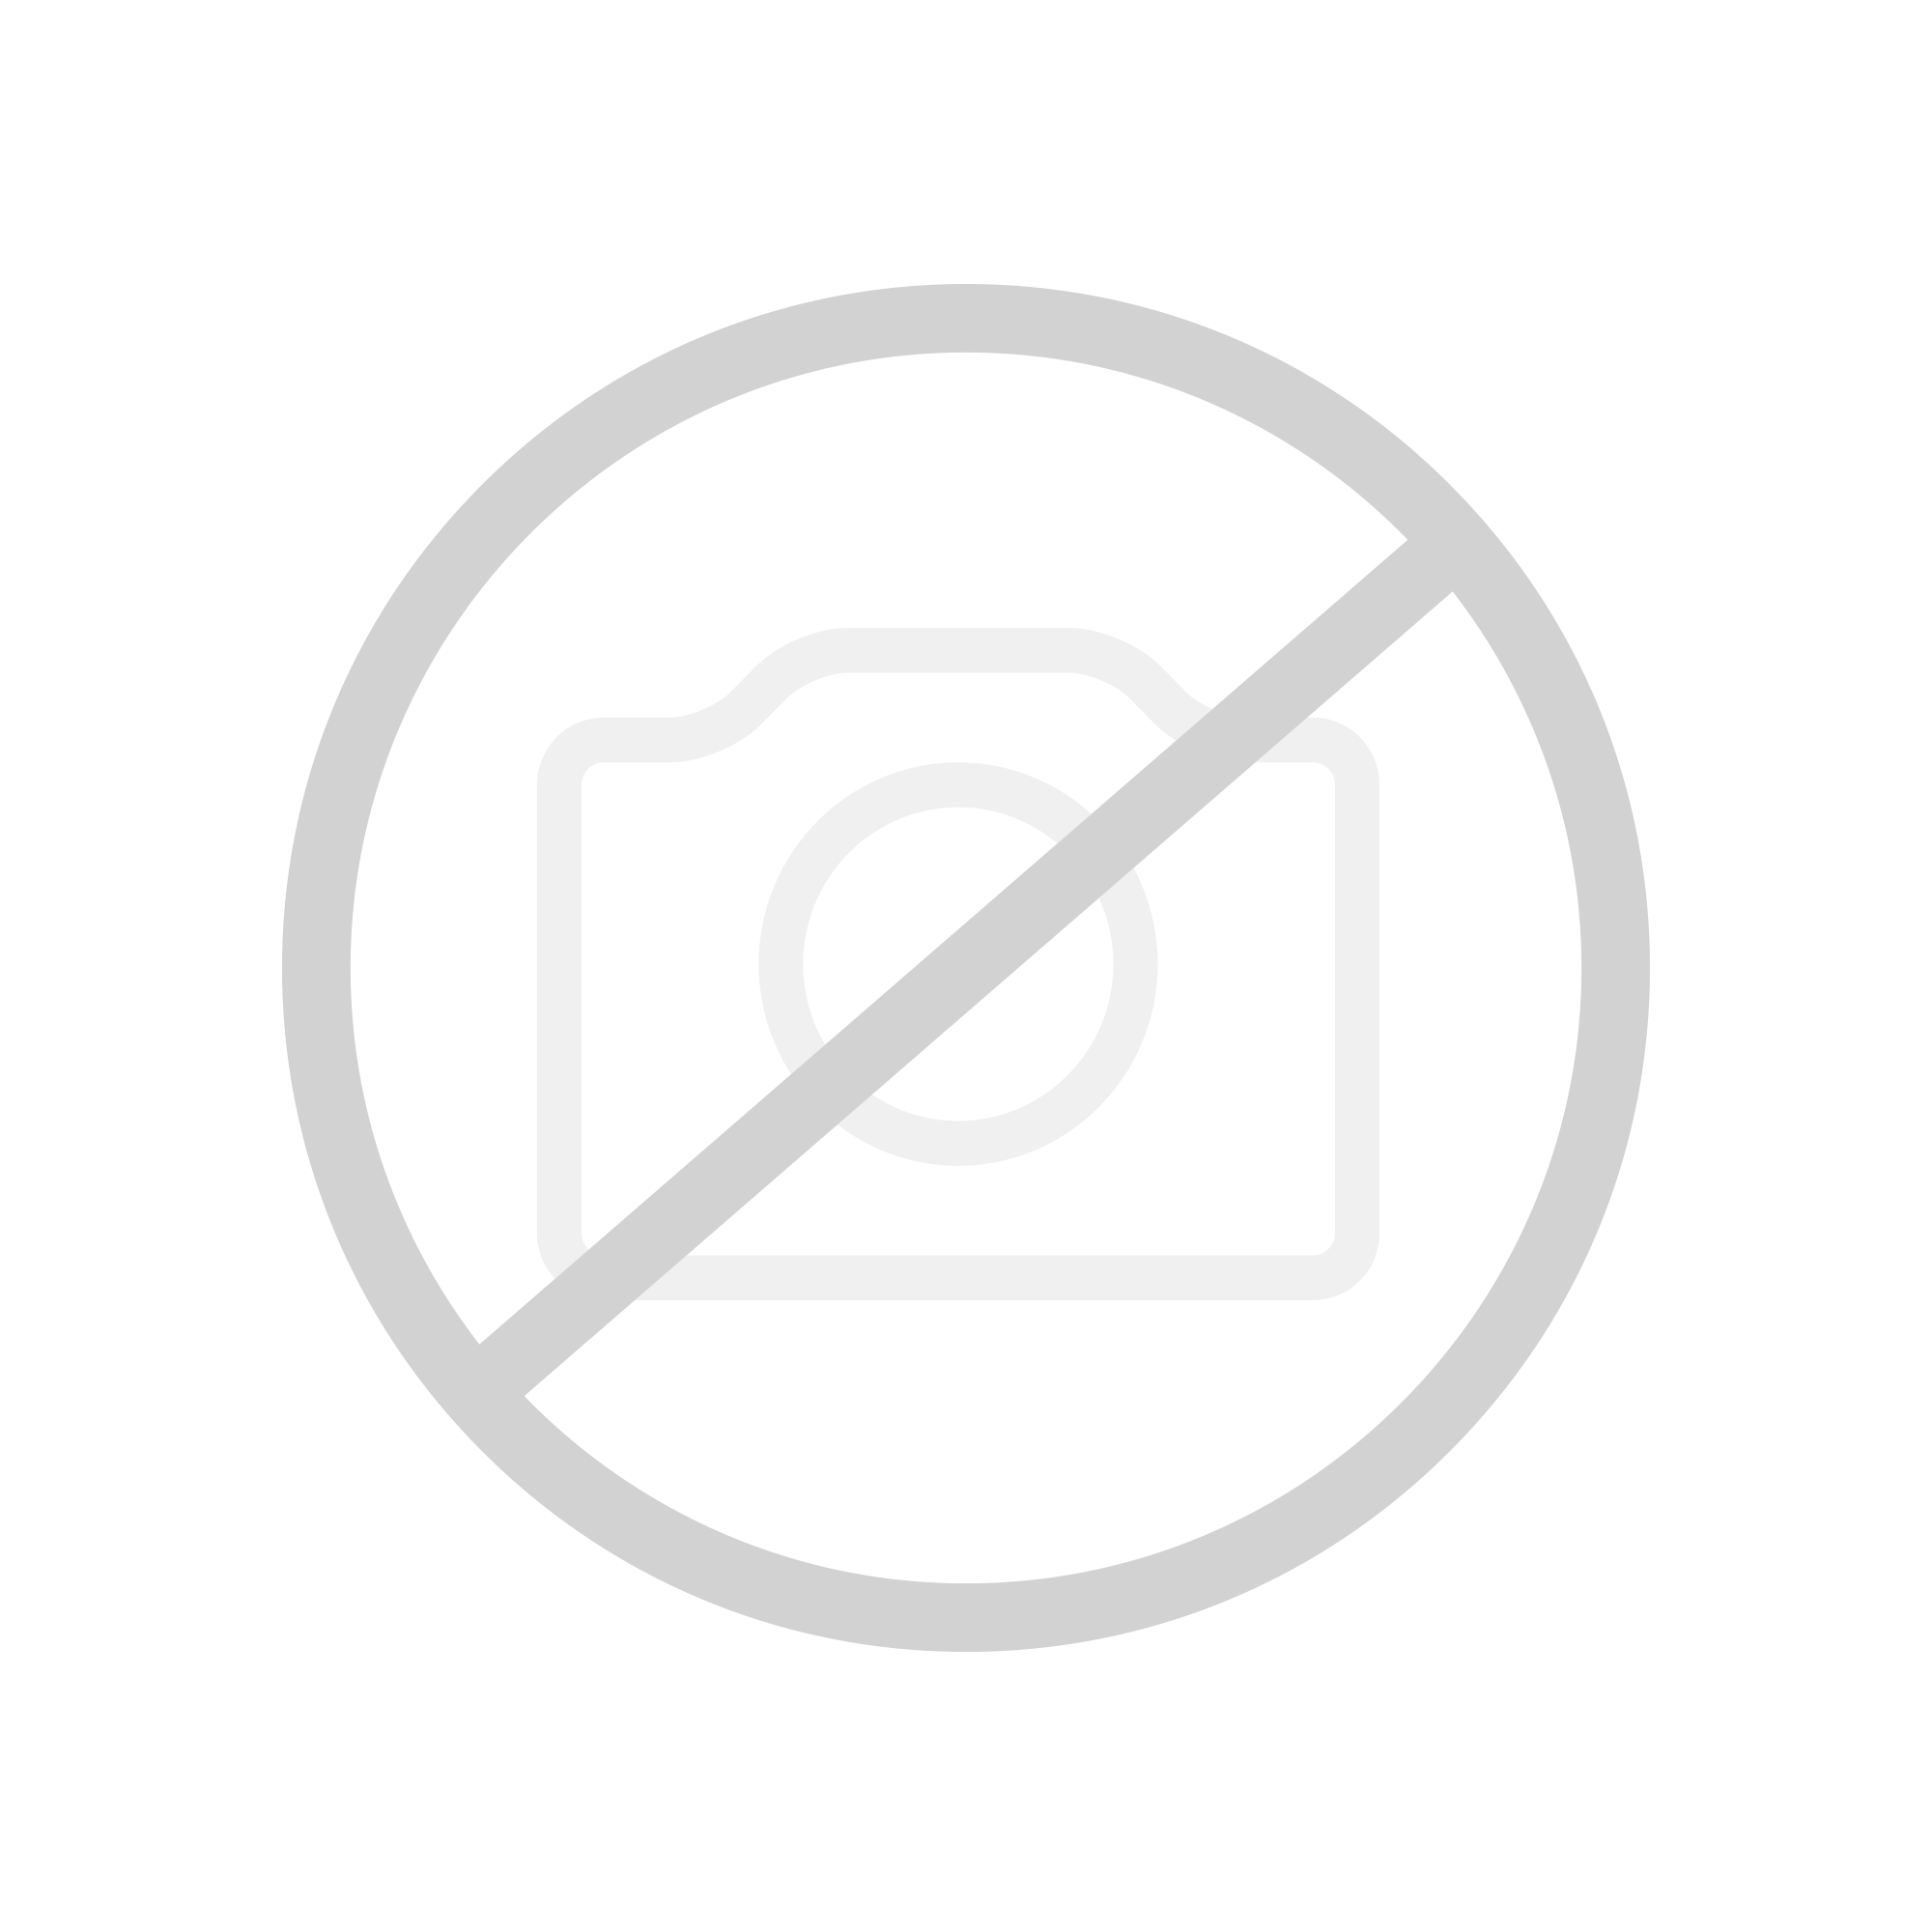 louis poulsen PH 3 ½-3 Pendelleuchte mit Aluminiumschirm